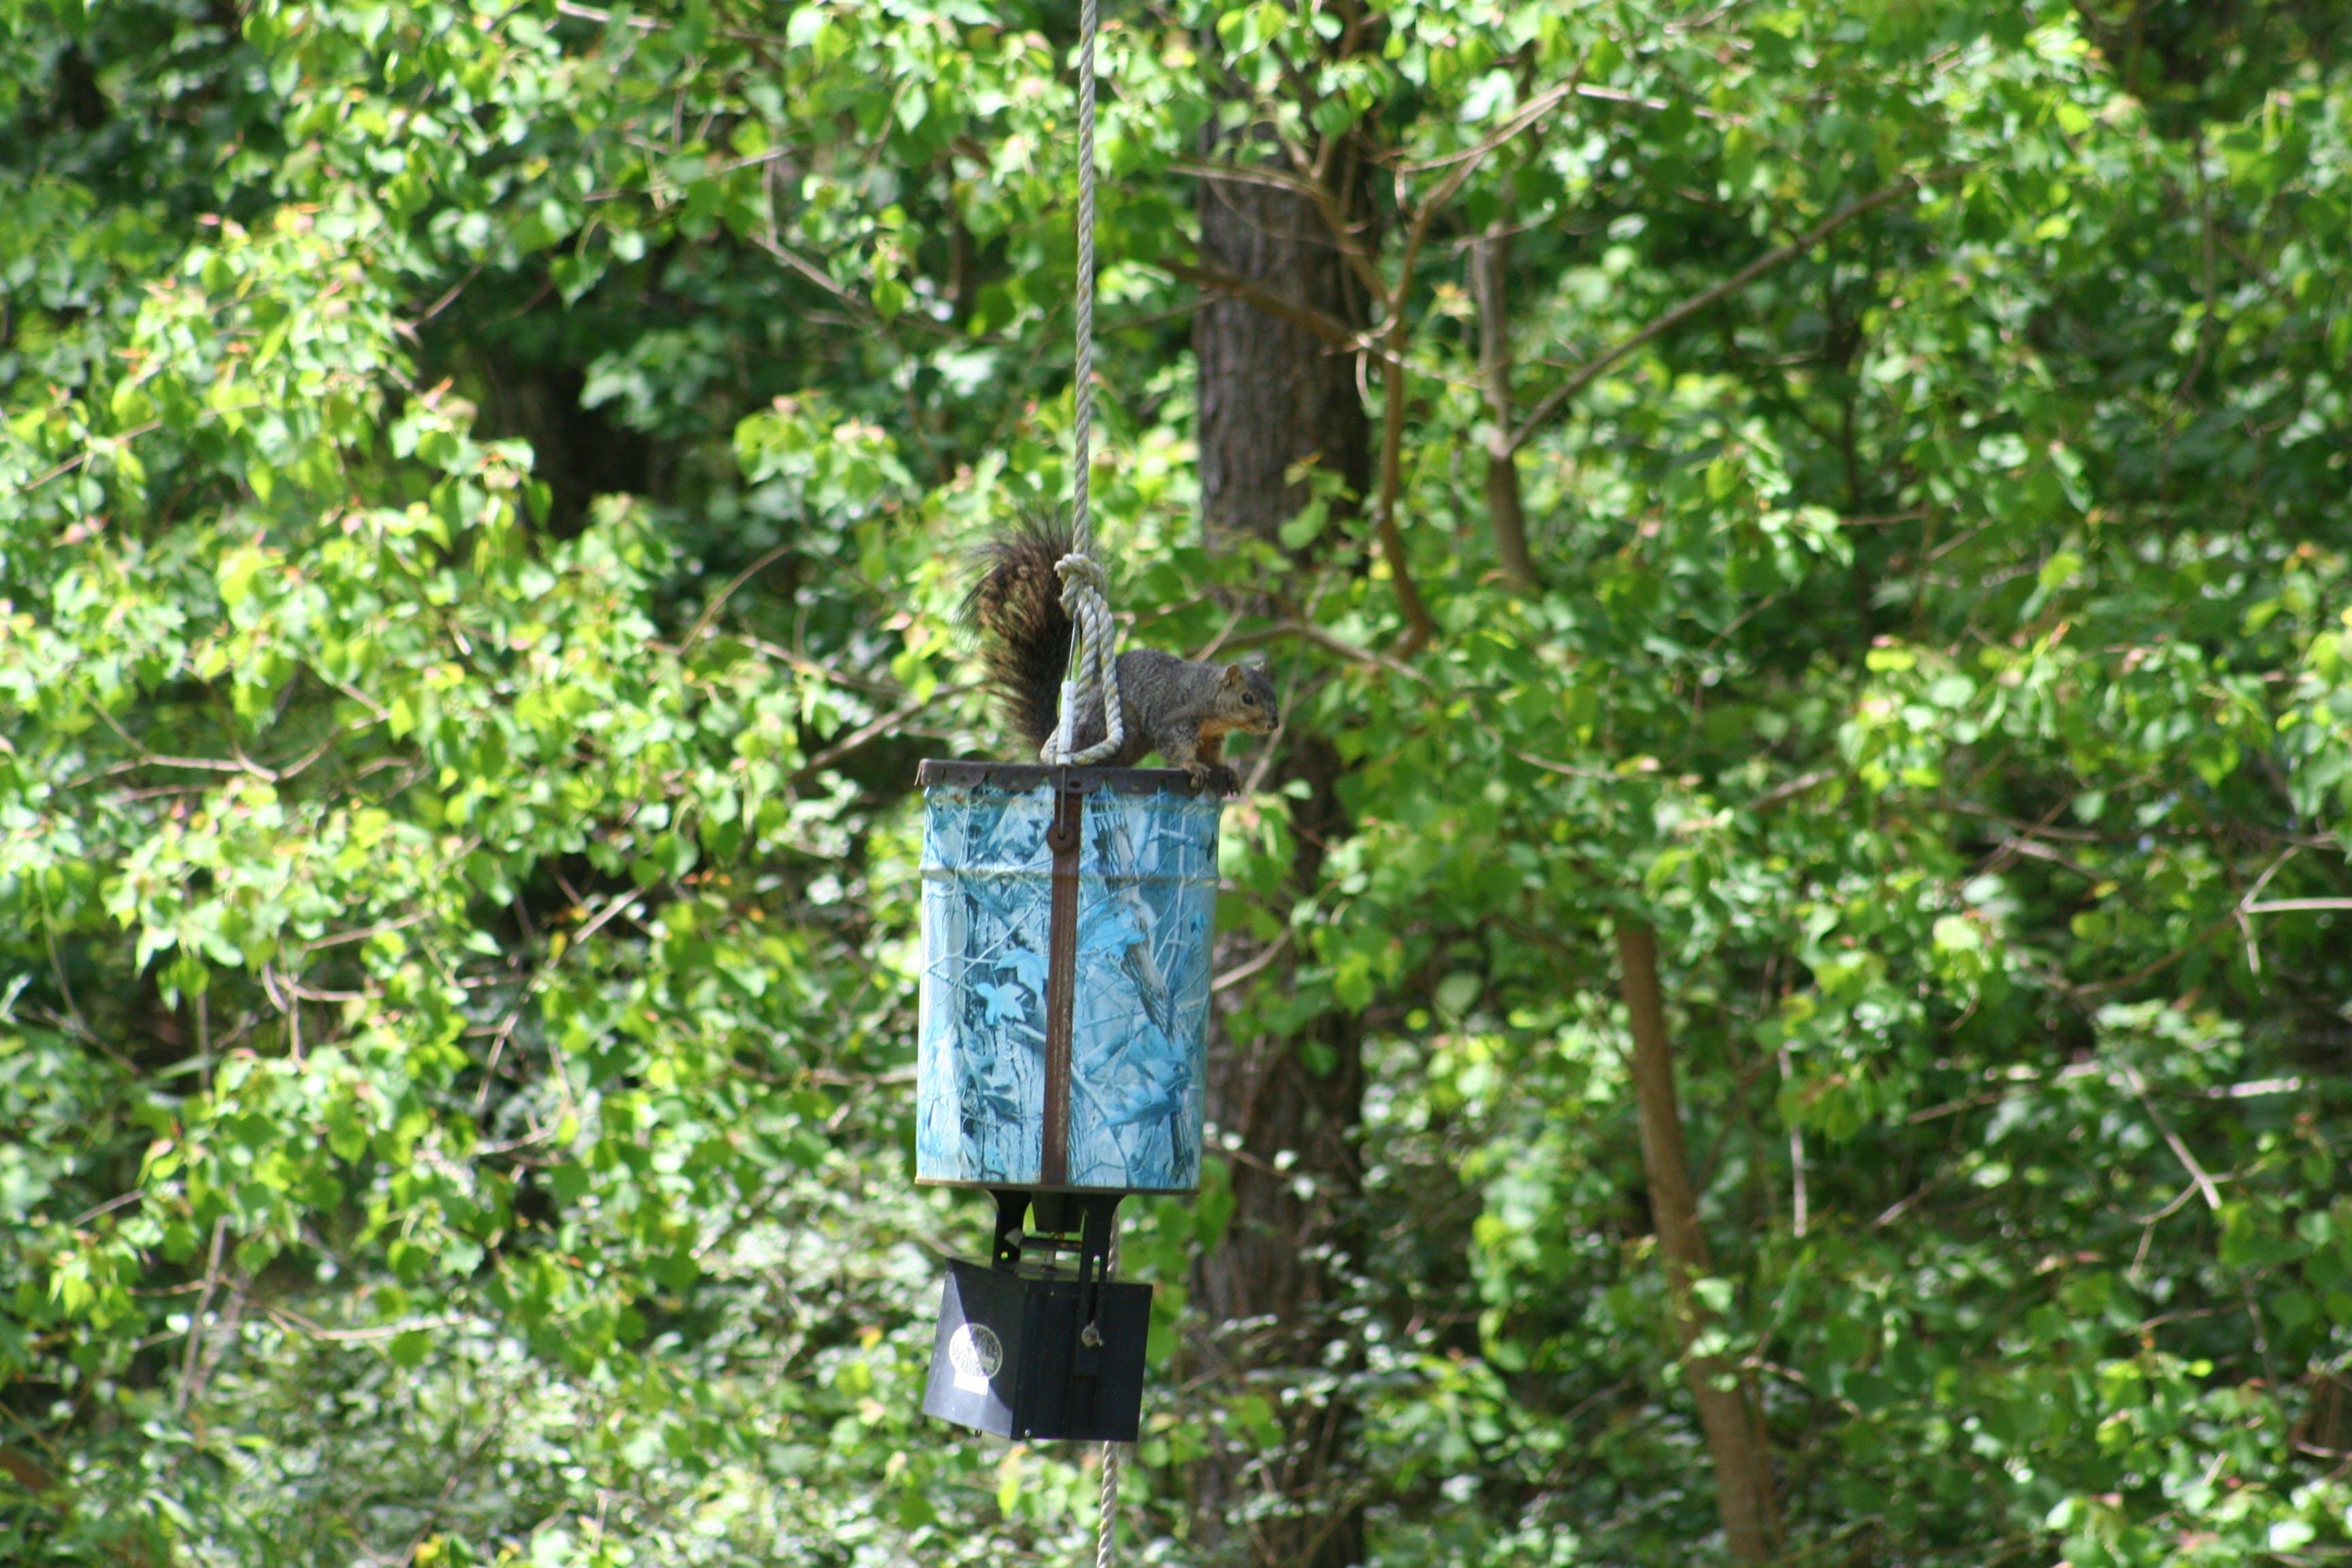 Gratis lagerfoto af egern, hjorte feeder, louisiana, natur